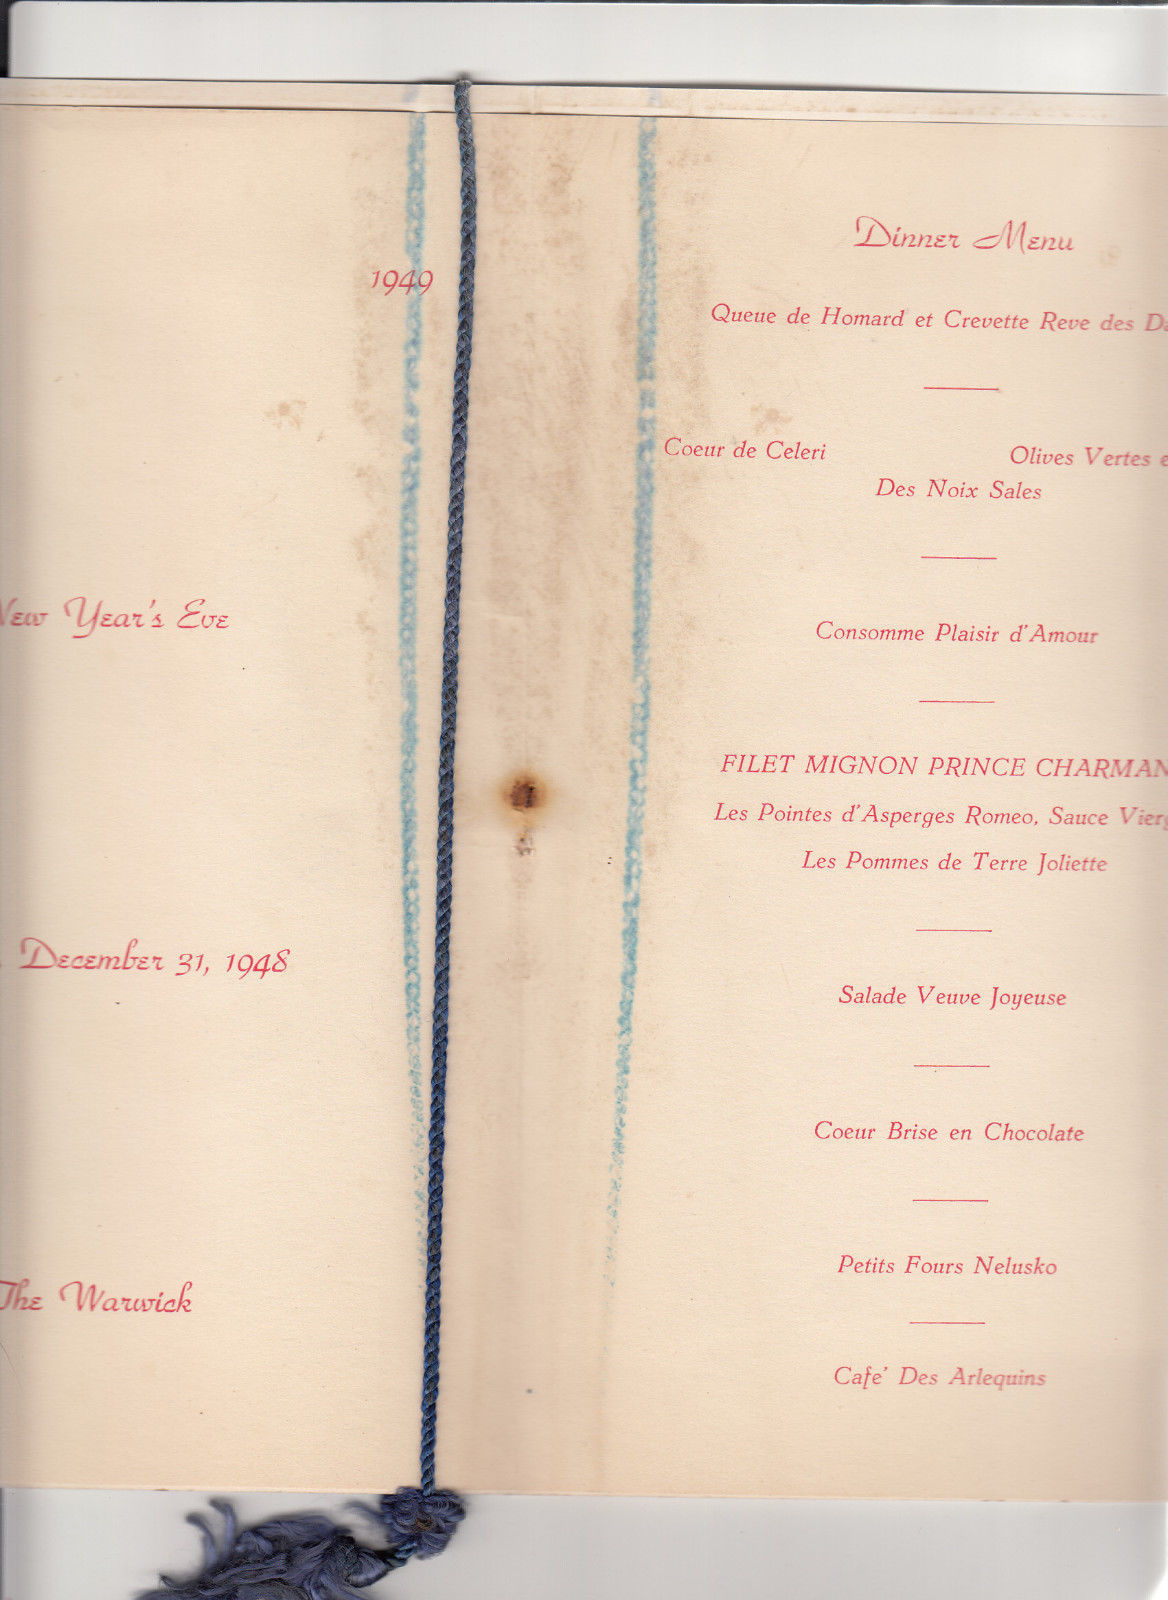 The Warwick Hotel Philadelphia PA Happy New Year Menu 1949